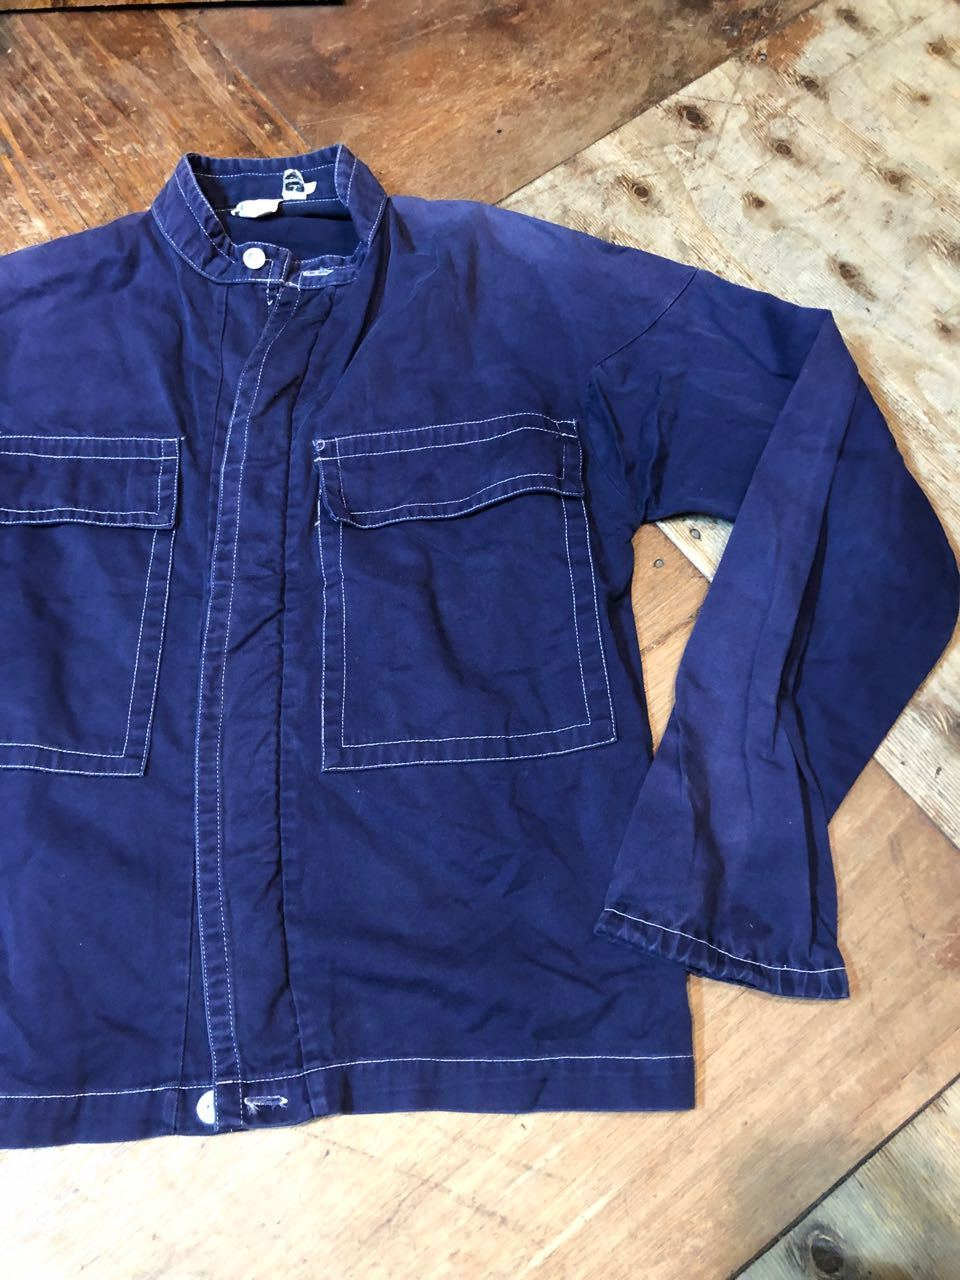 3月28日(木)入荷! 60s Penny\'s Towncraft all cotton Jacket!!_c0144020_14010513.jpg